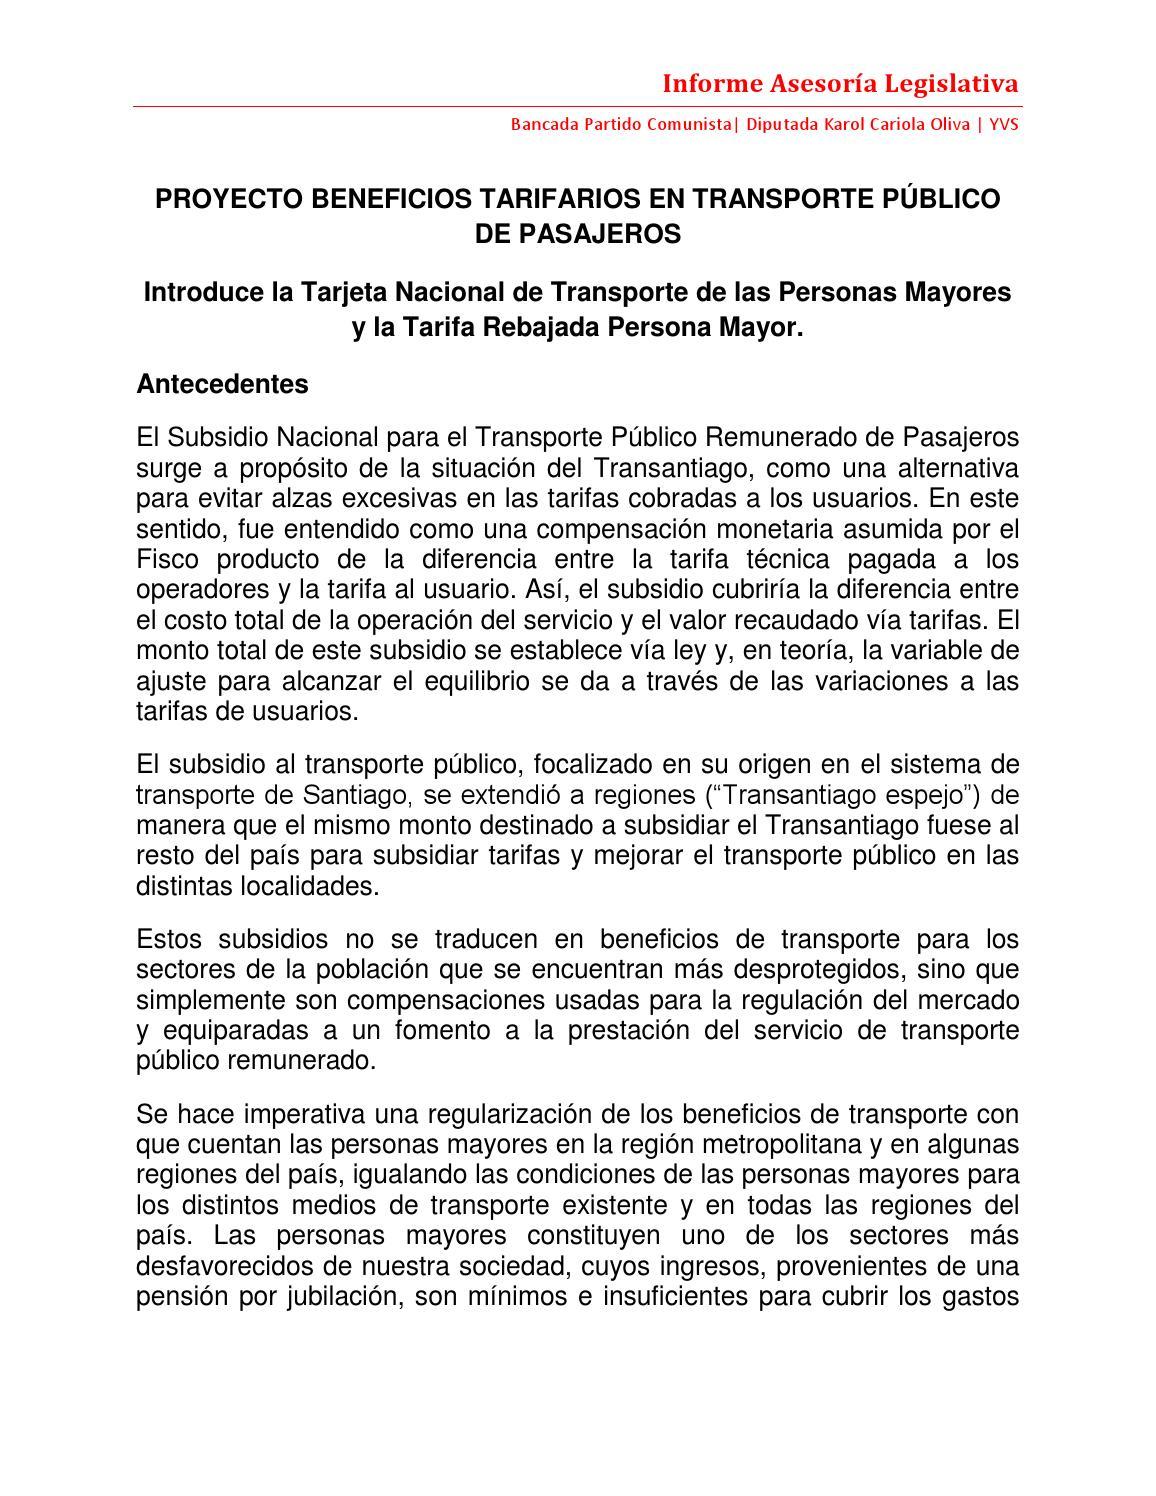 ley tarjeta transporte: